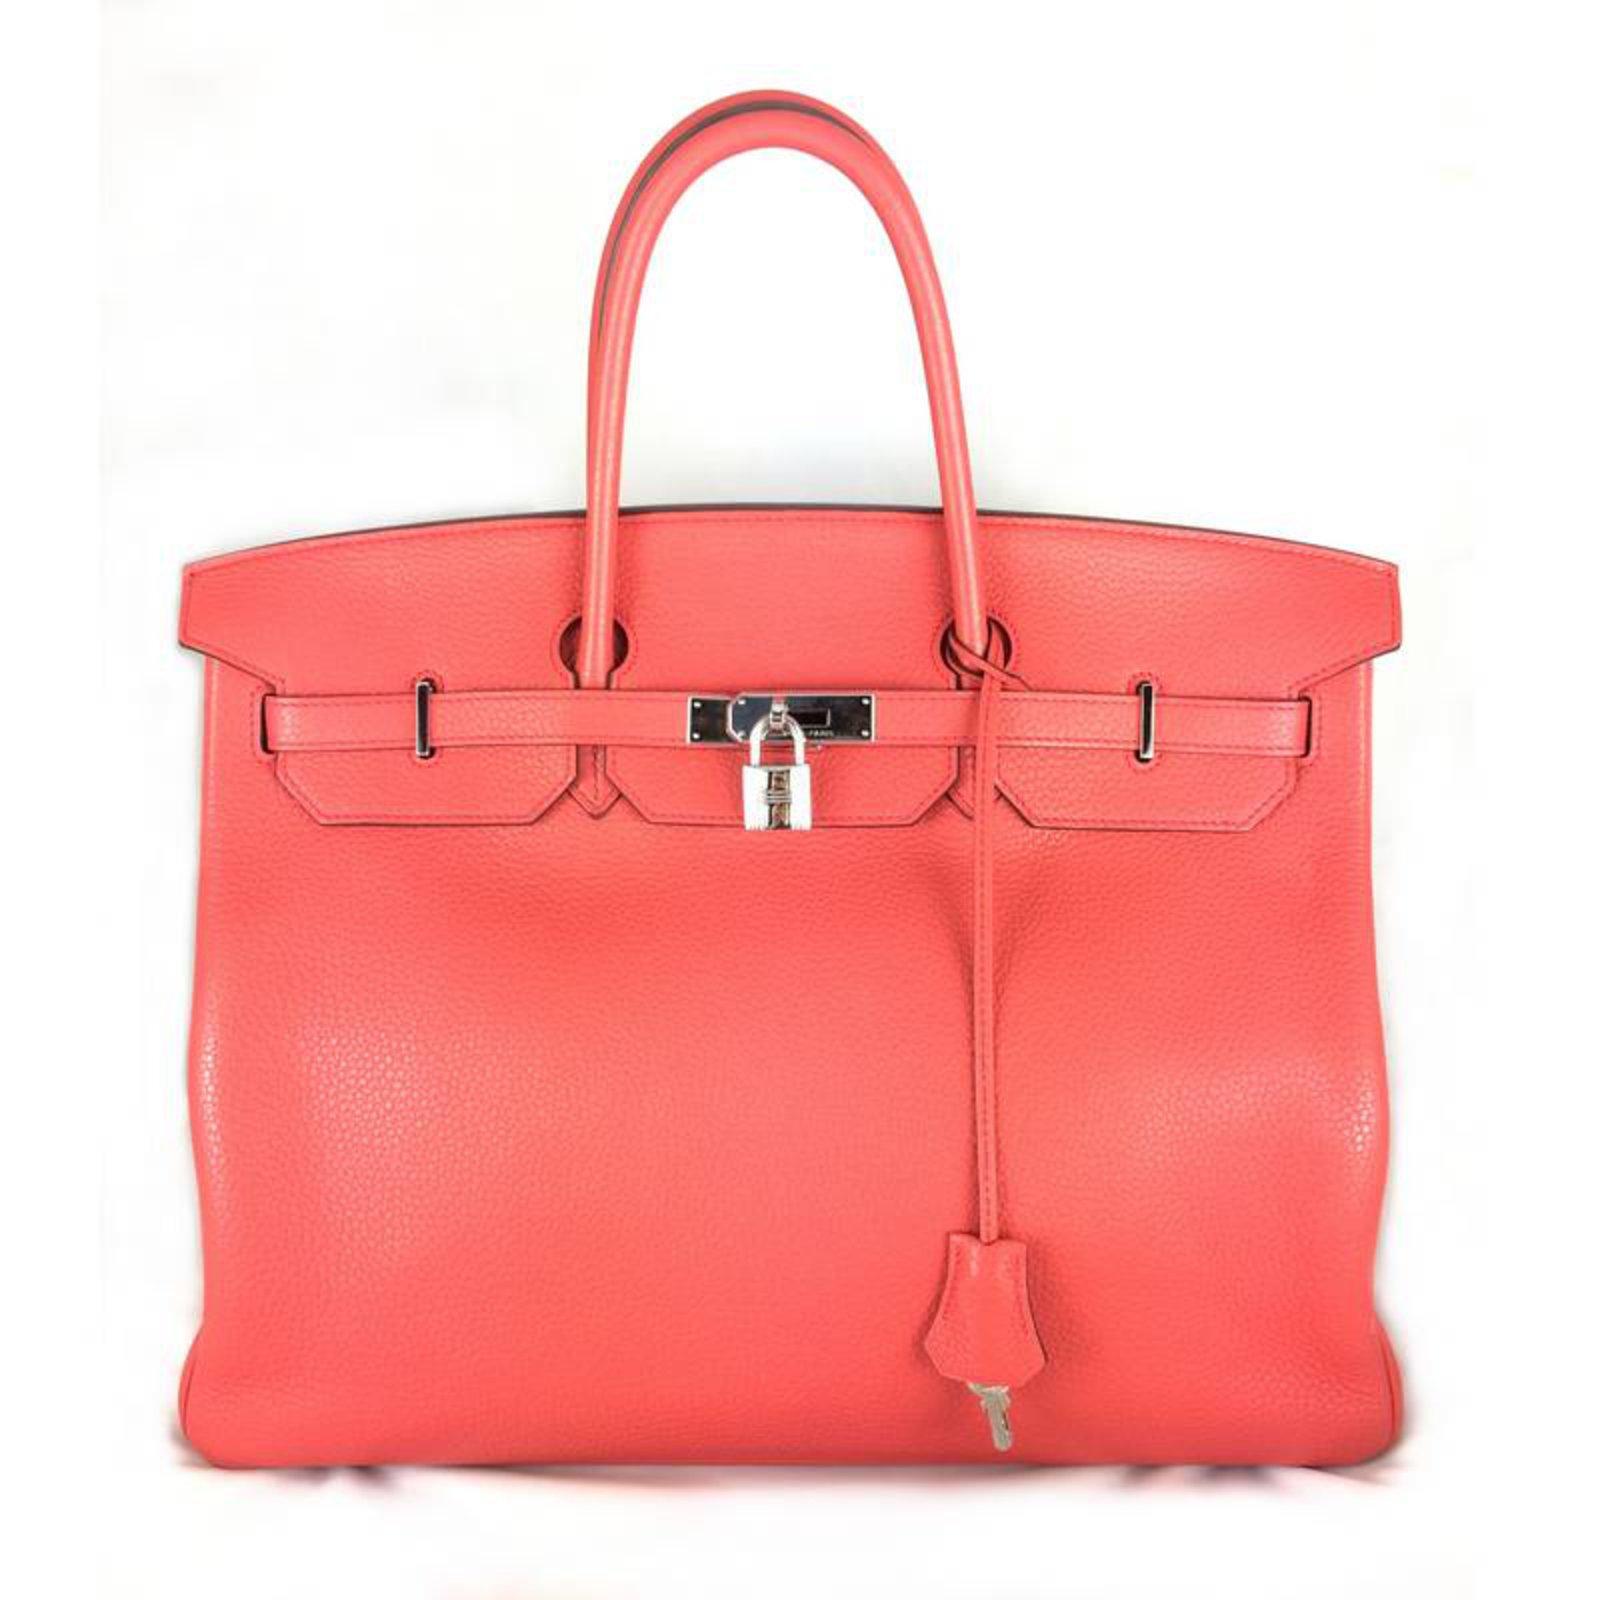 0c14b14095 ... clearance hermès birkin 40 bougainvillea togo handbags leather pink  ref.29227 42220 16c3f ...